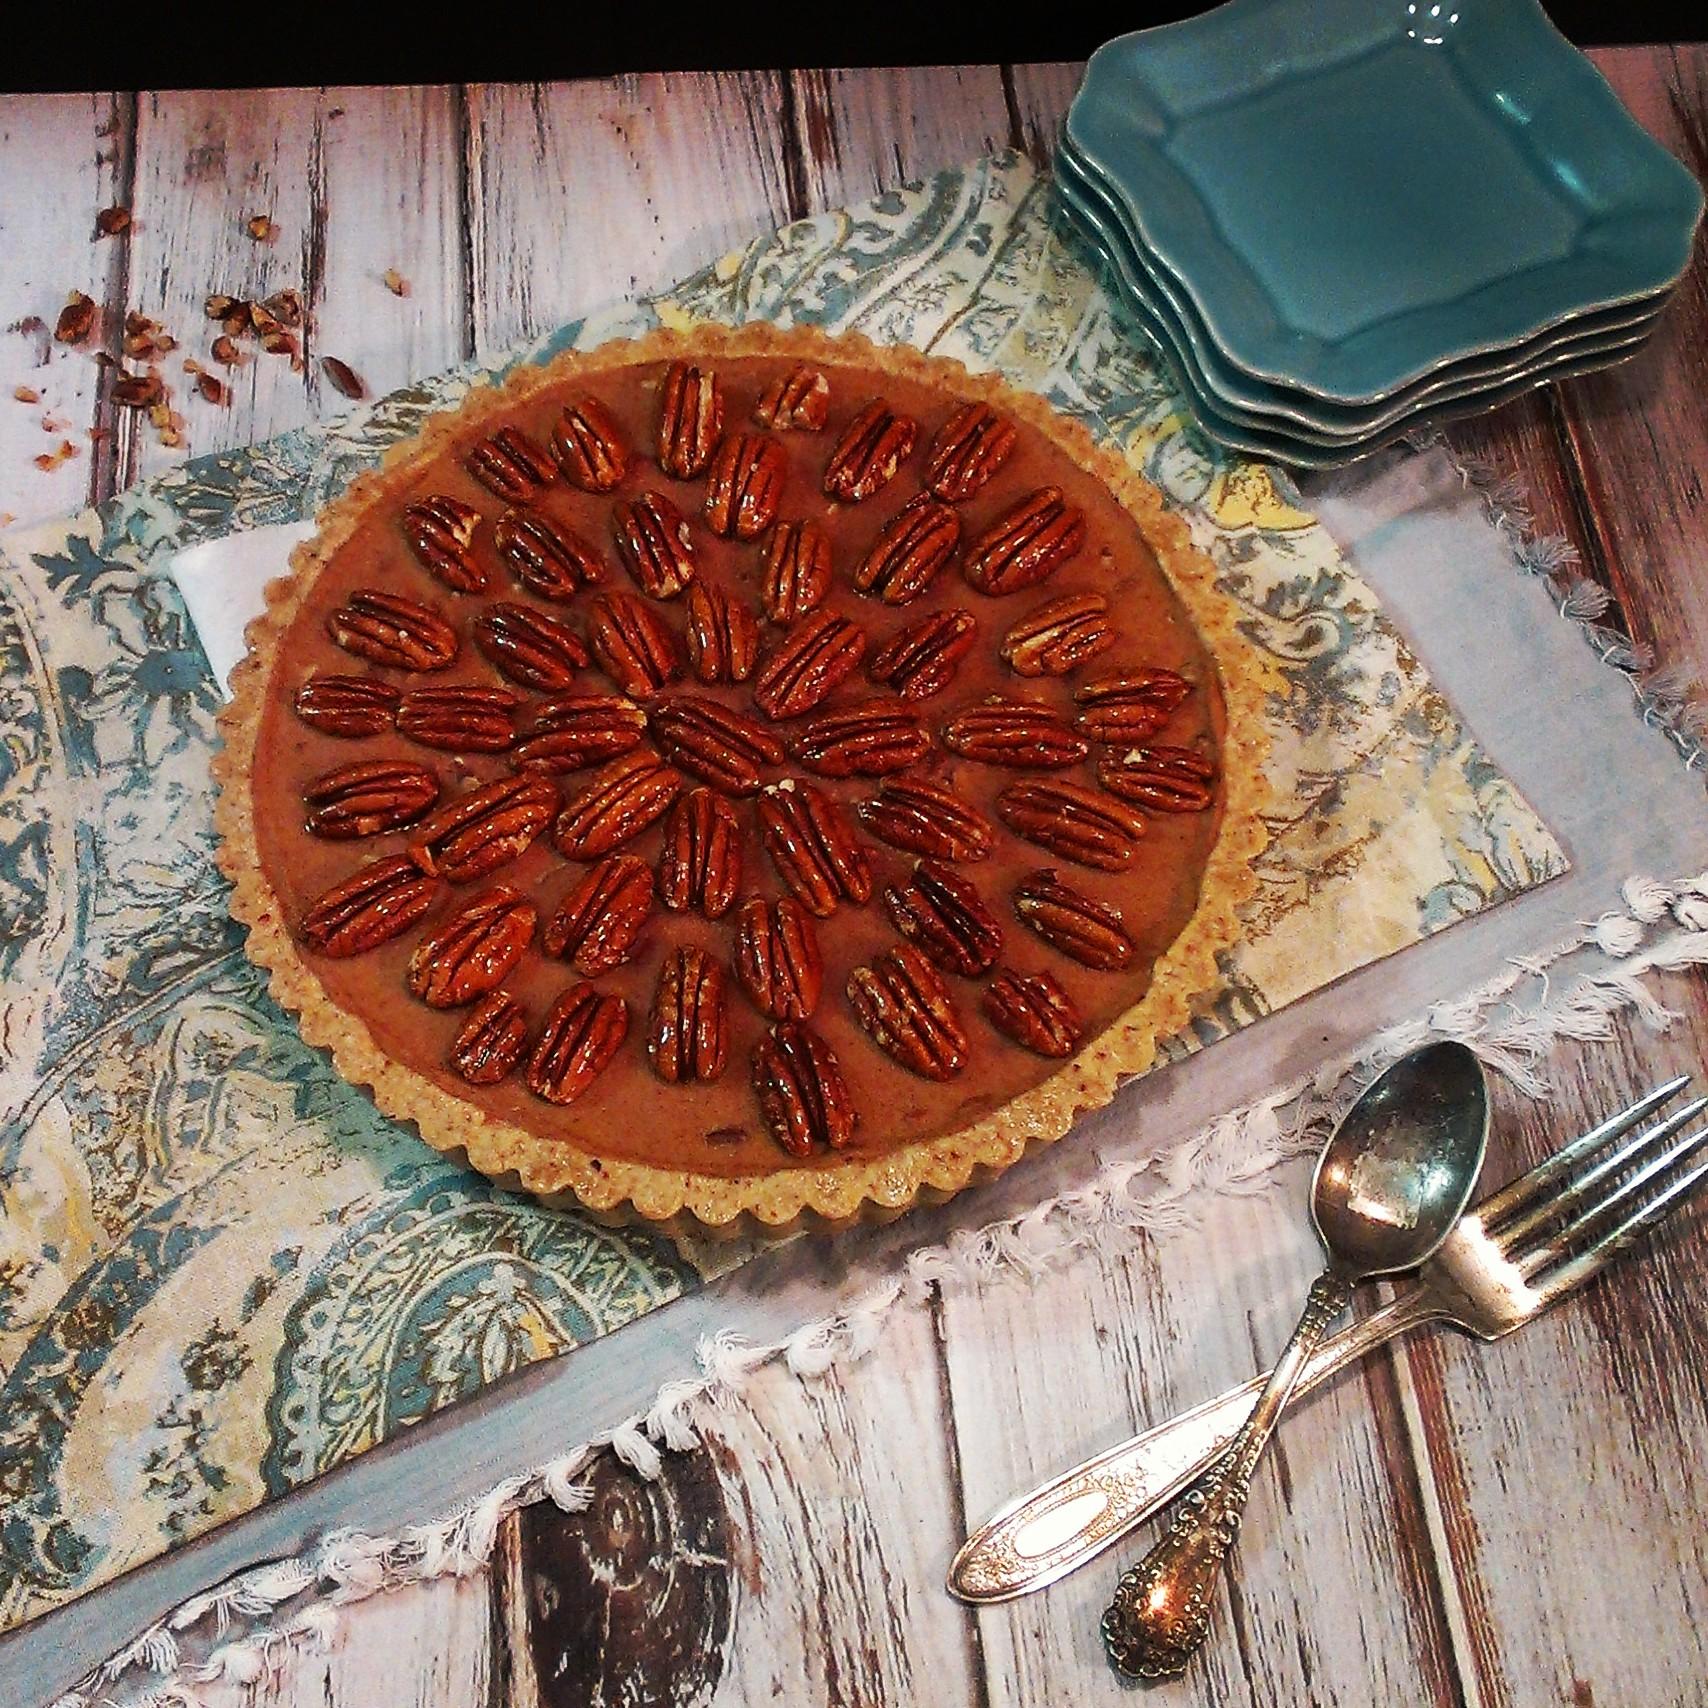 pecan pie, almond pressed crust, candied pecans